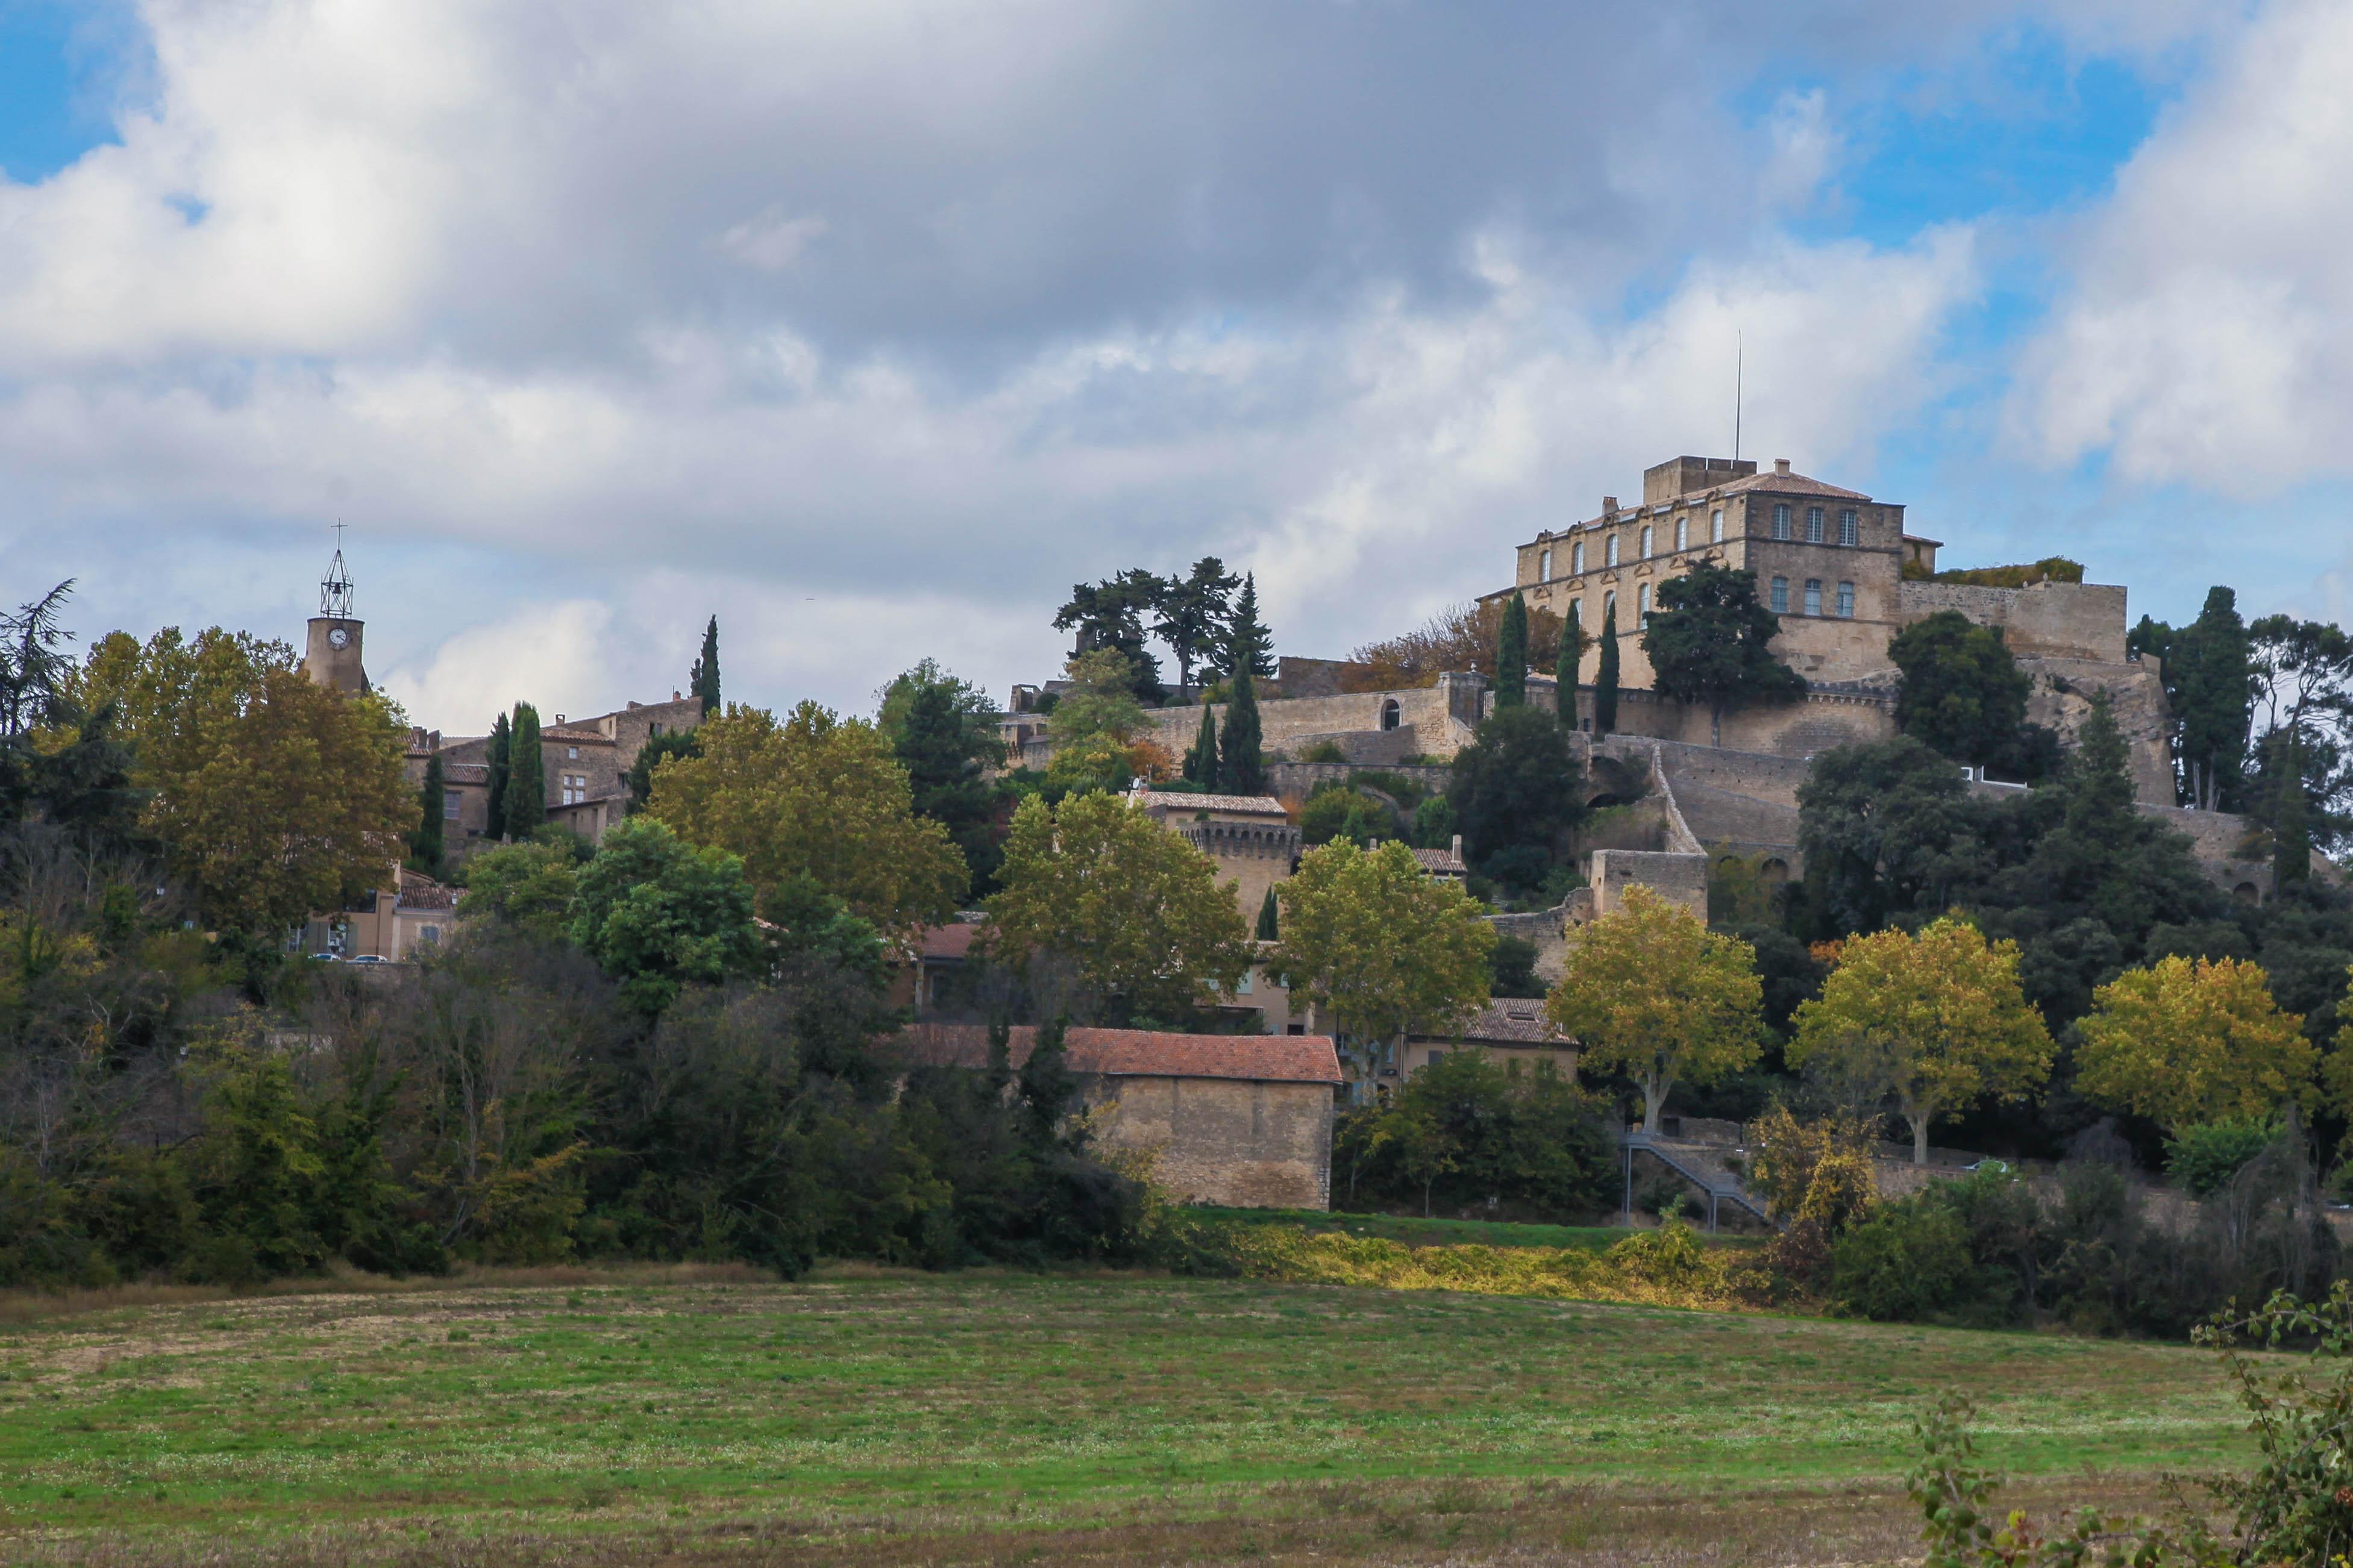 The hilltop village